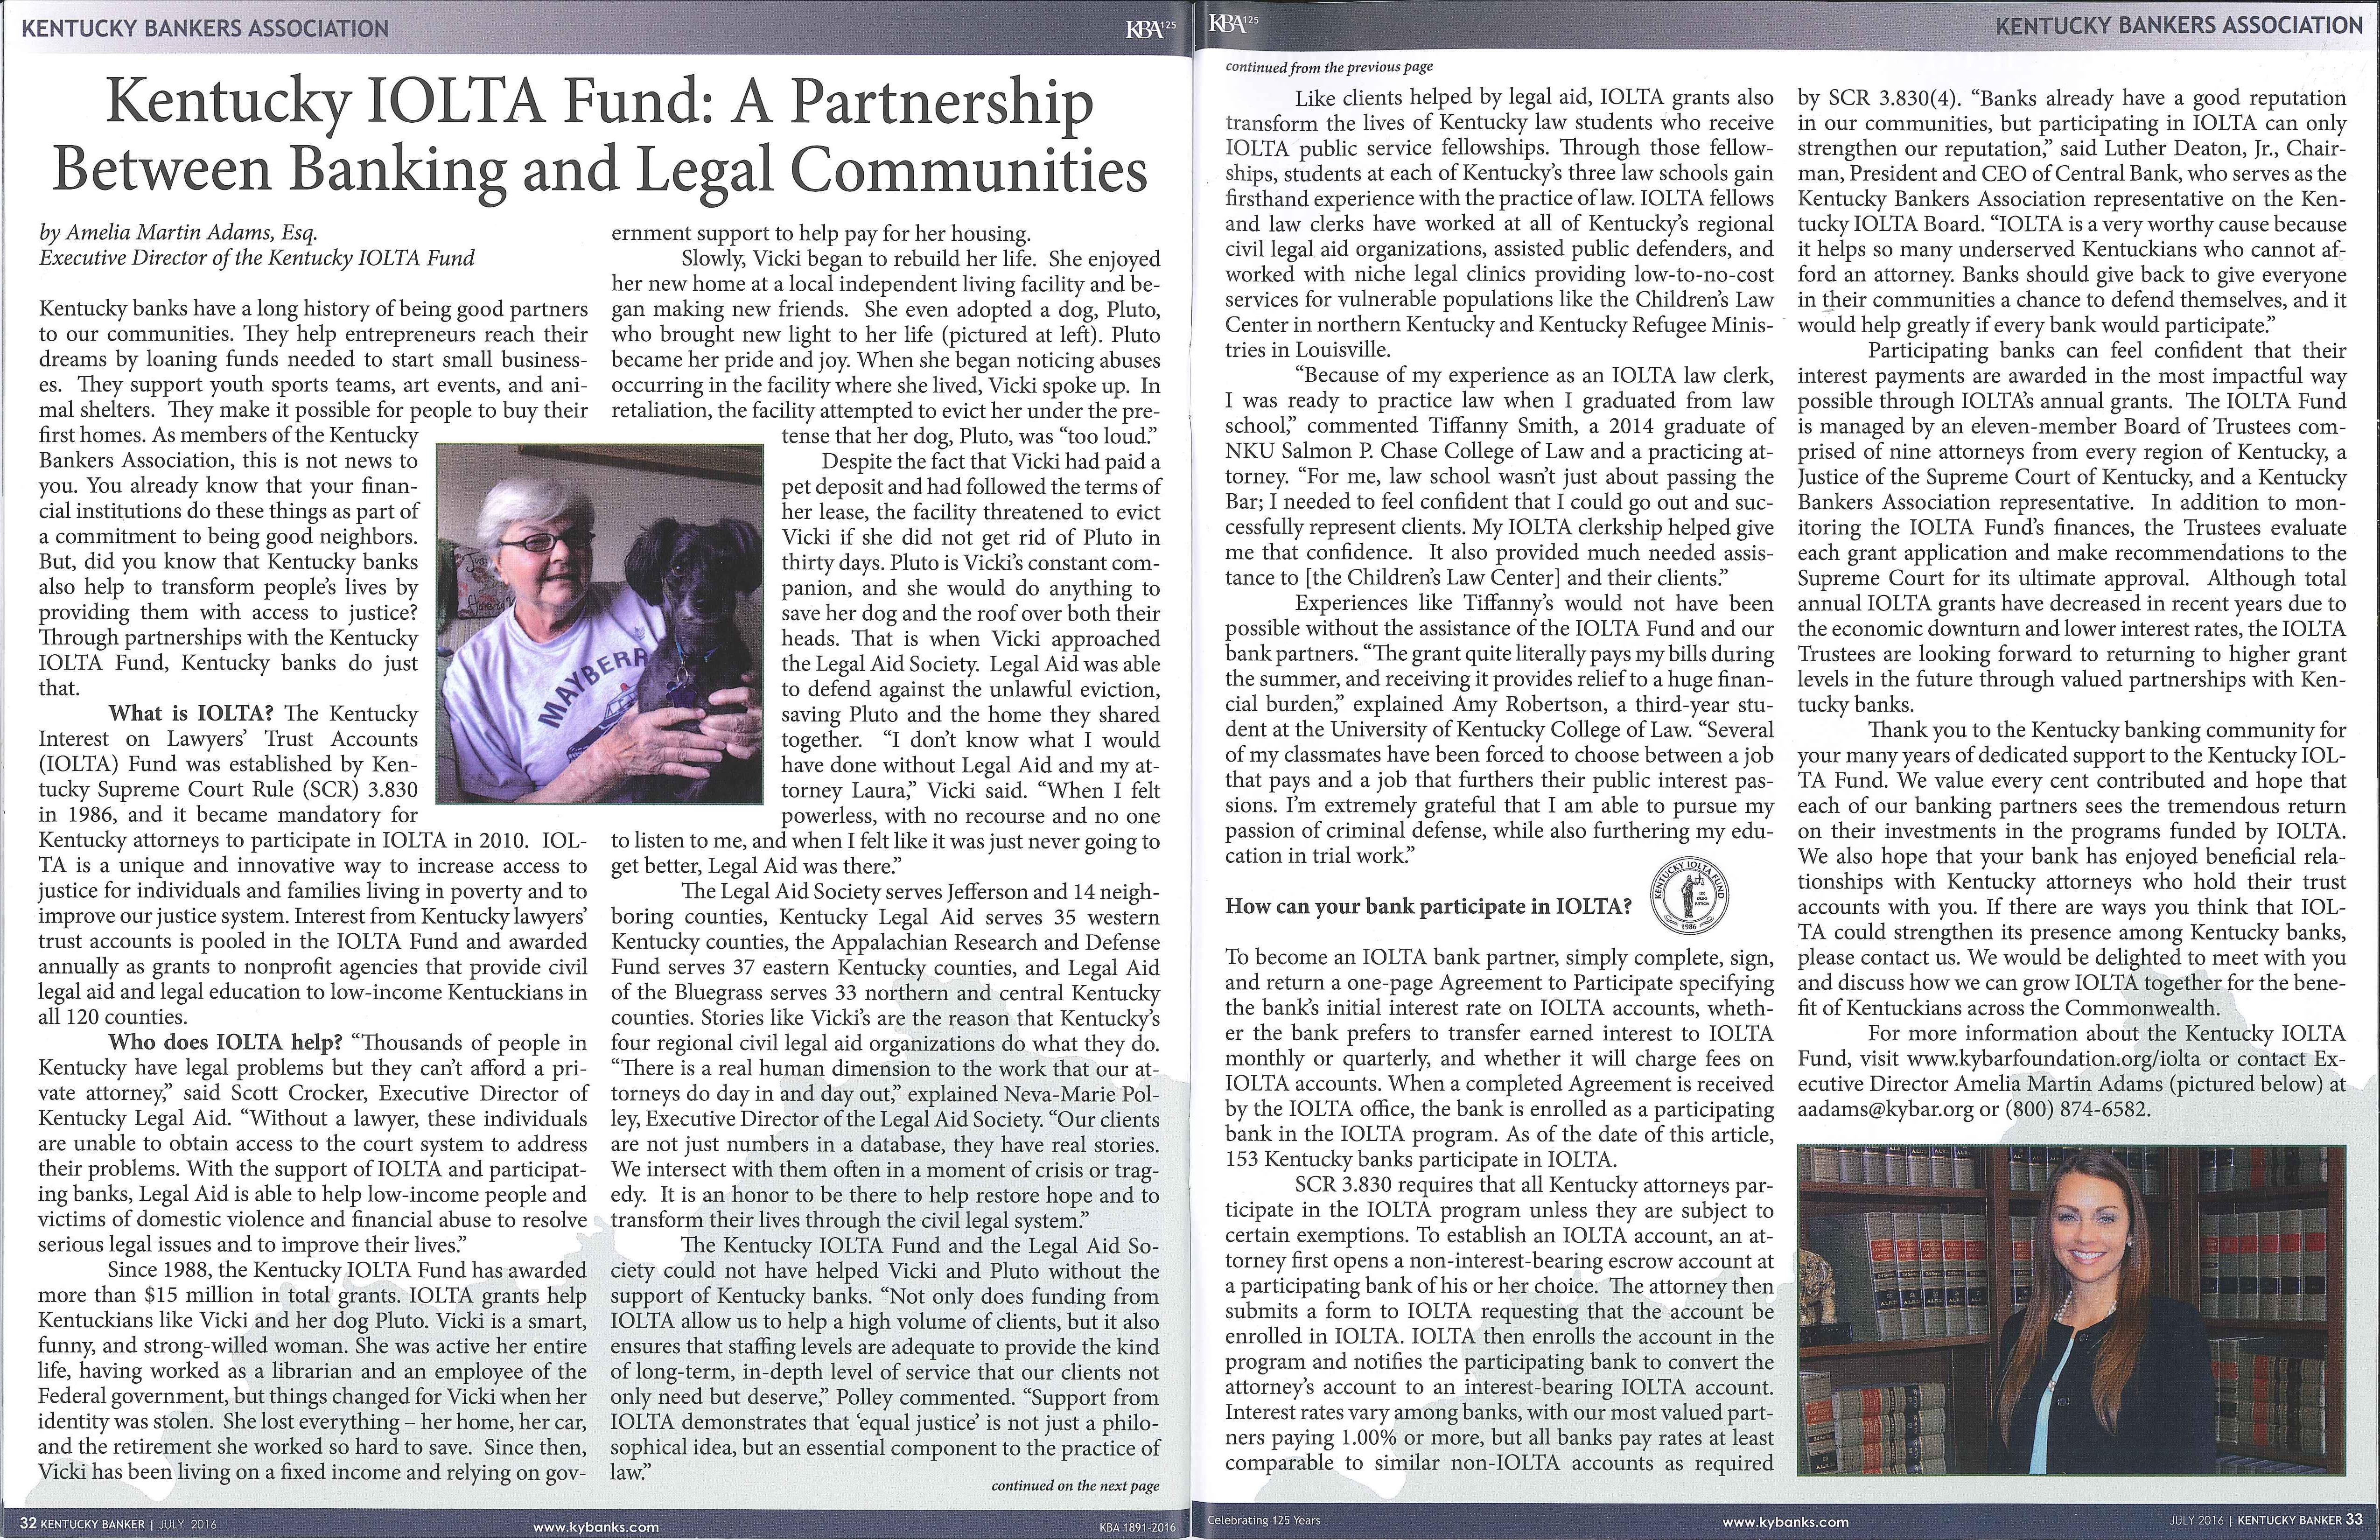 KBA article